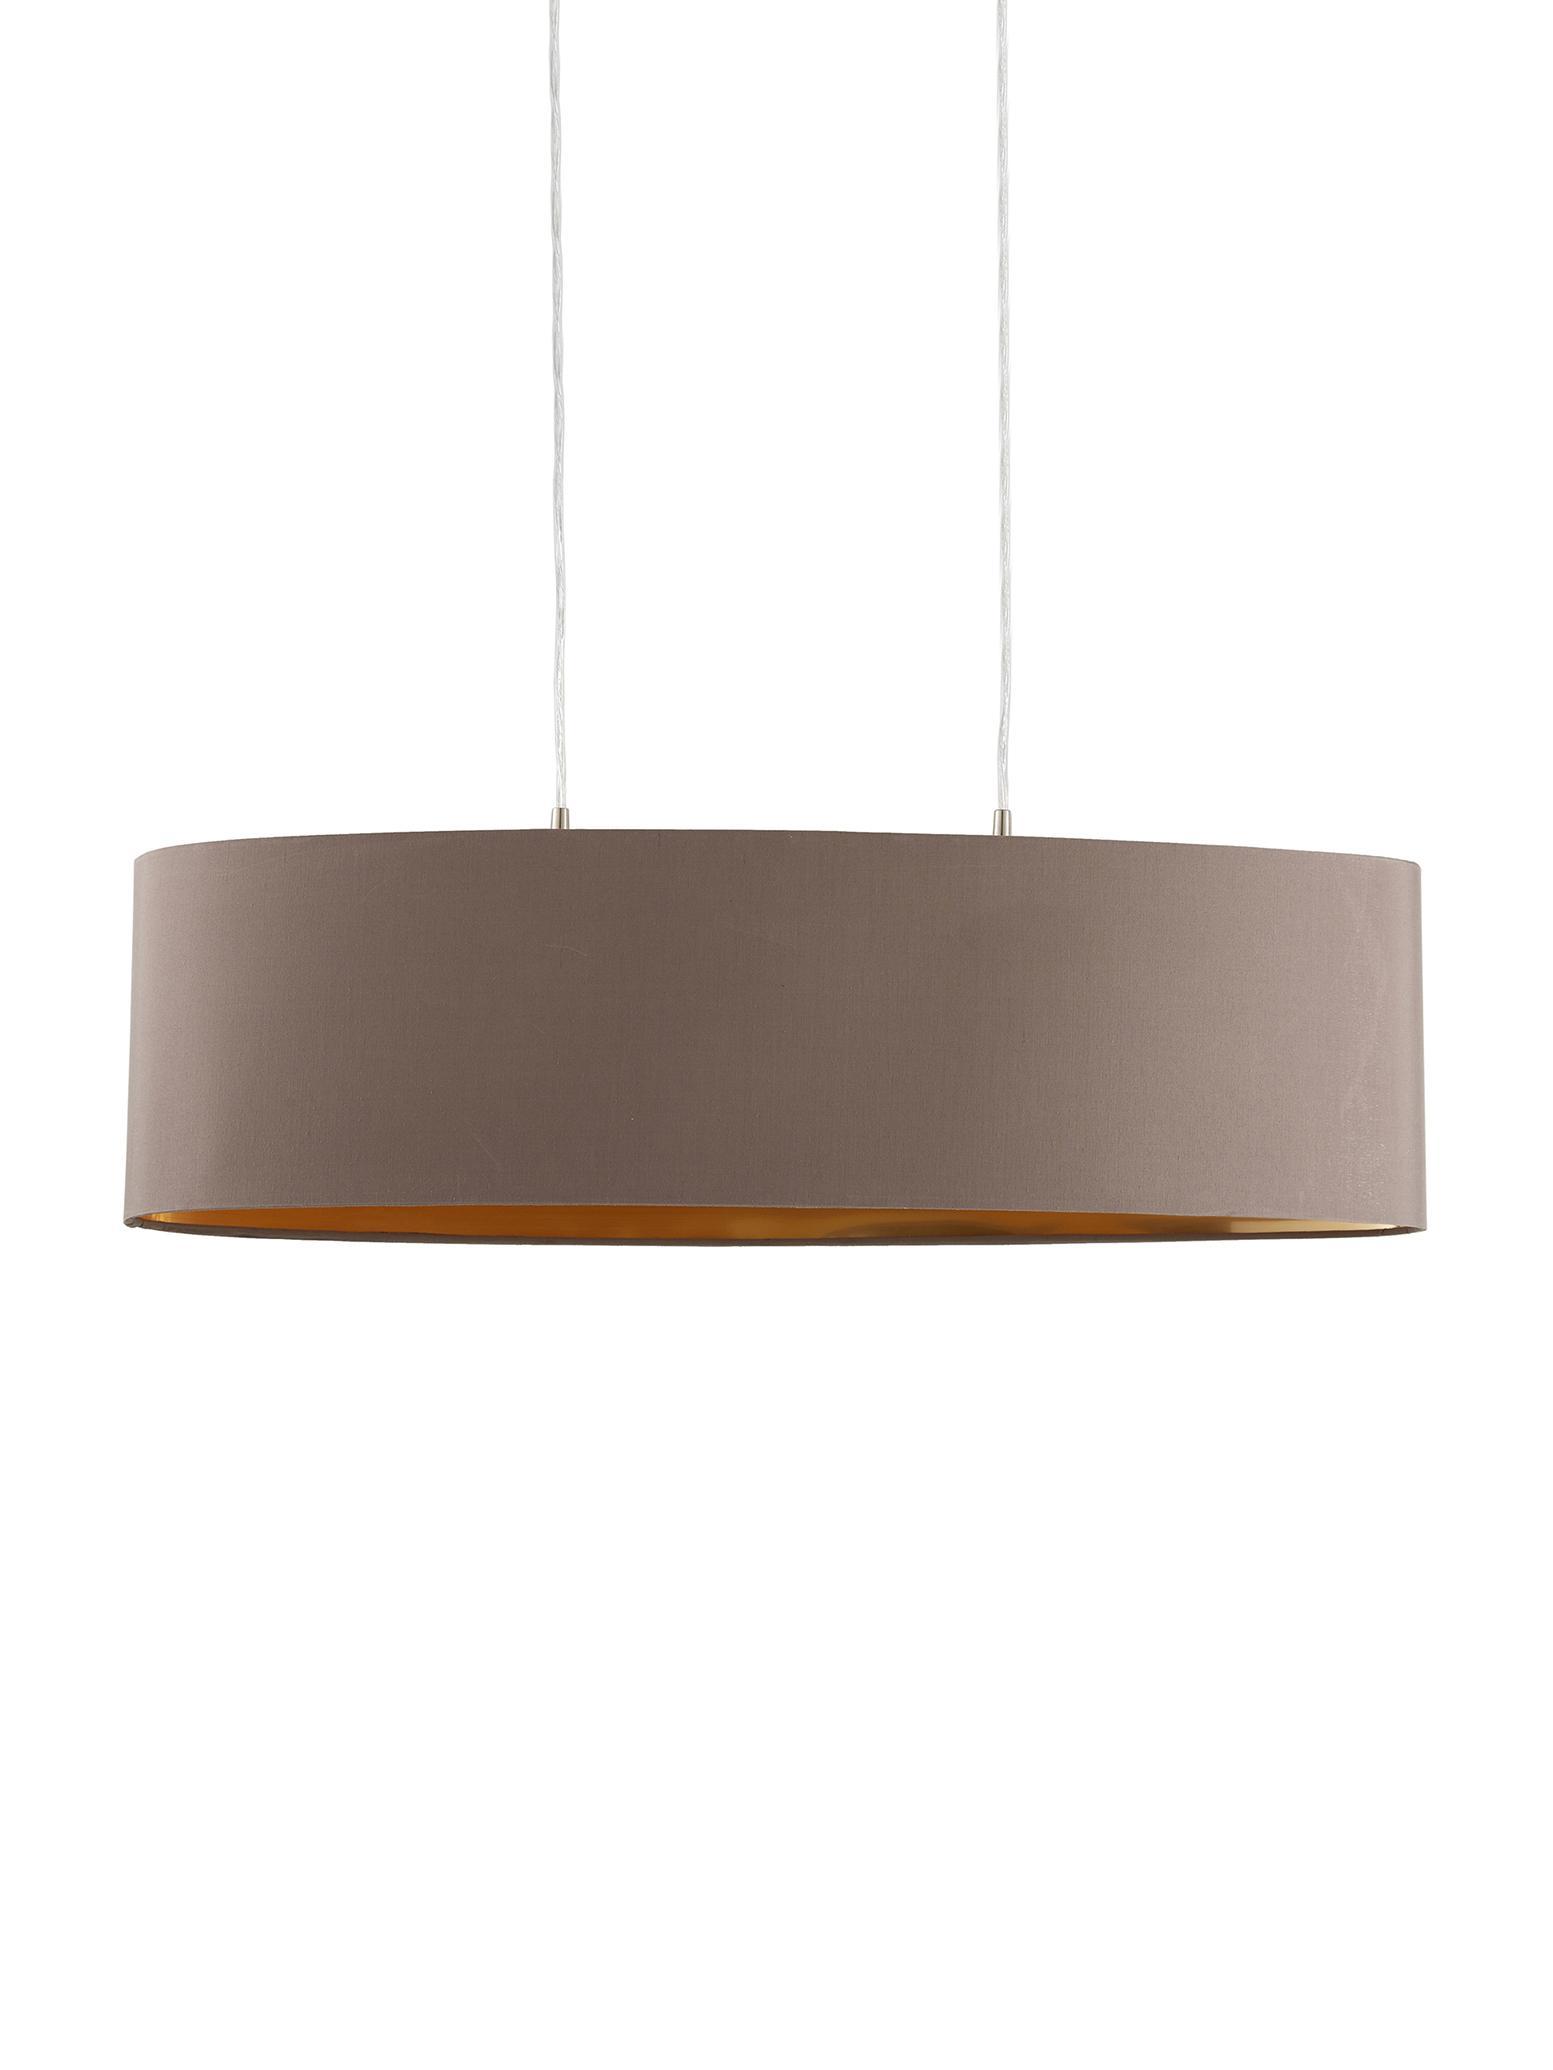 Lampada a sospensione ovale Jamie, Baldacchino: metallo nichelato, Argento, grigio-beige, Larg. 78 x Alt. 22 cm